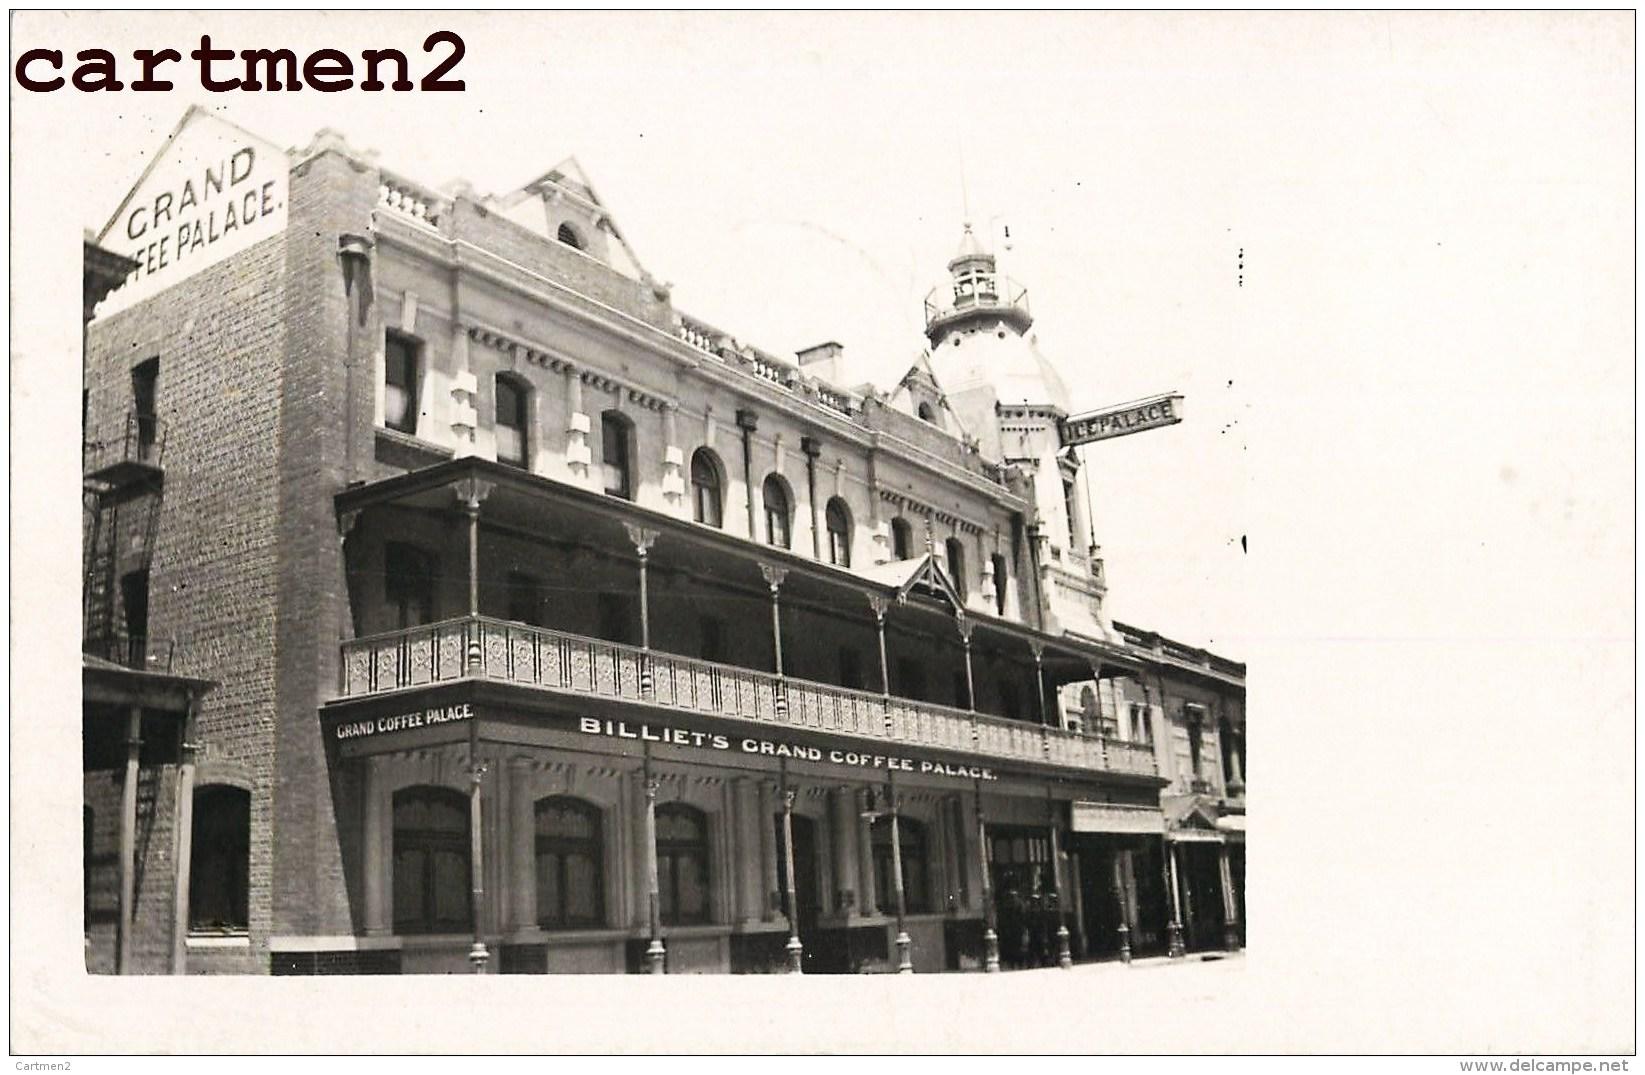 CARTE PHOTO : ADELAÏDE BILLIET'S GRAND COFFEE PALACE AUSTRALIA AUSTALIA - Adelaide